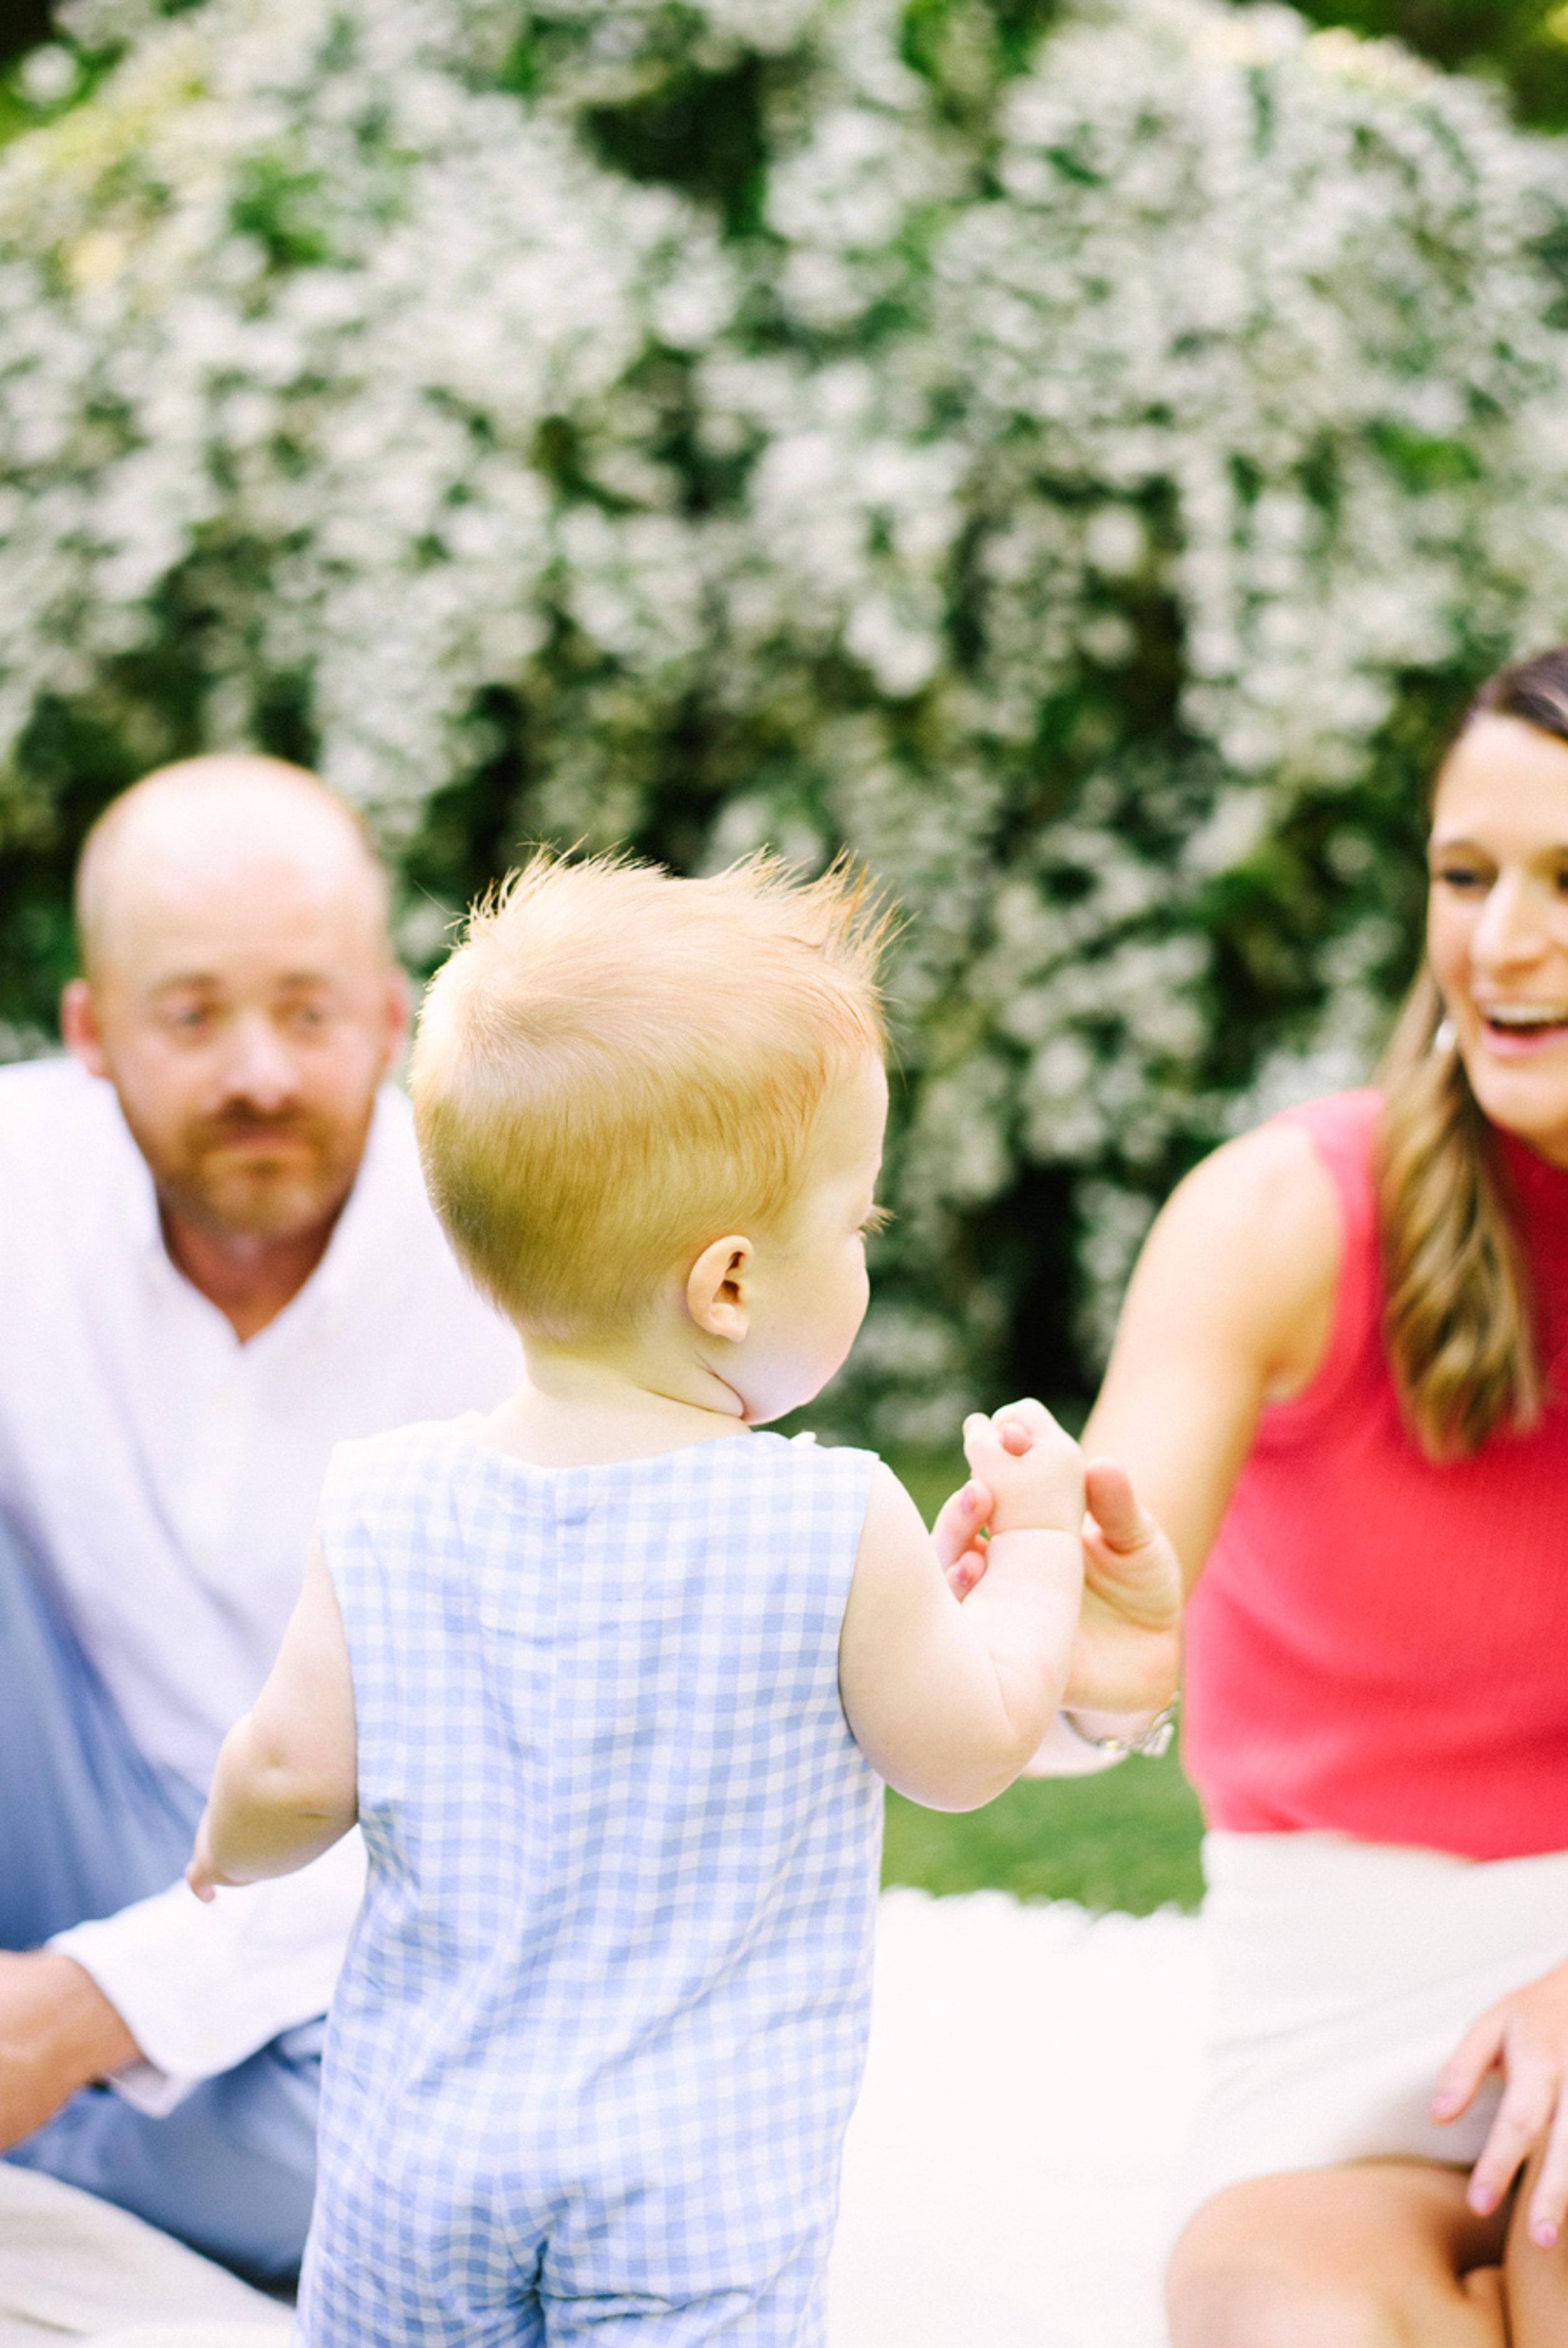 Atlanta Photographer; family photos; Atlanta family photographer; Athens Botantical Gardens; Athens Botanical Gardens family photos;